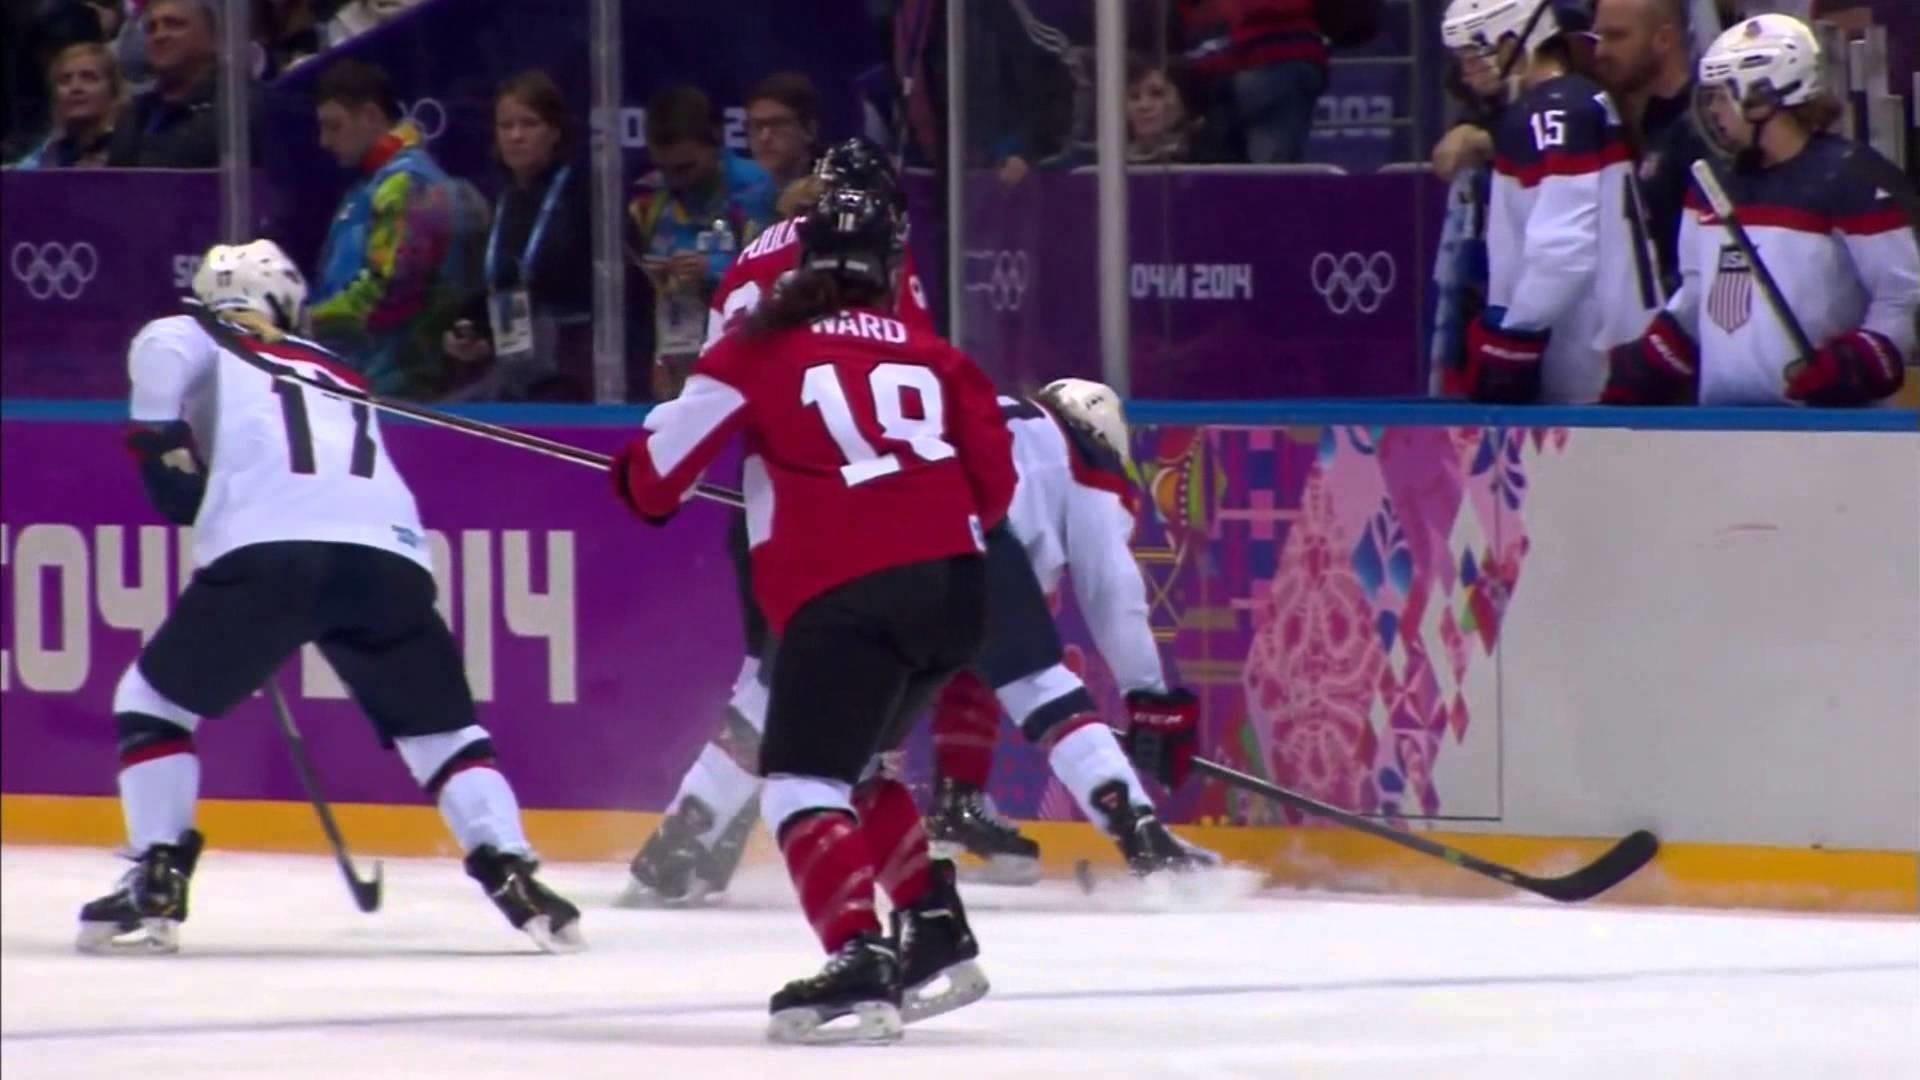 Res: 1920x1080, USA women's hockey